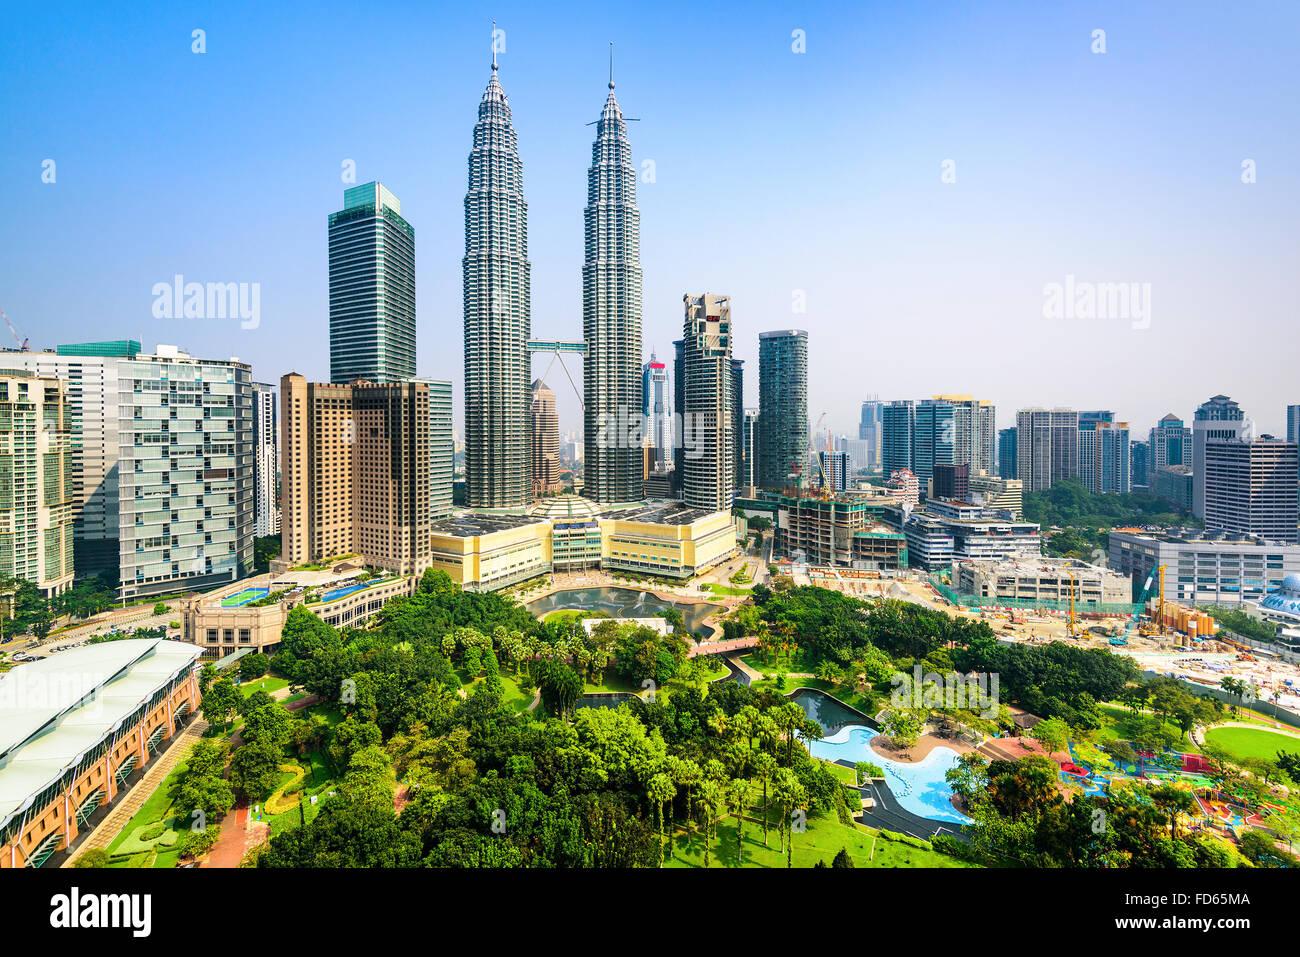 Kuala Lumpur, Malaysia City Center skyline. - Stock Image